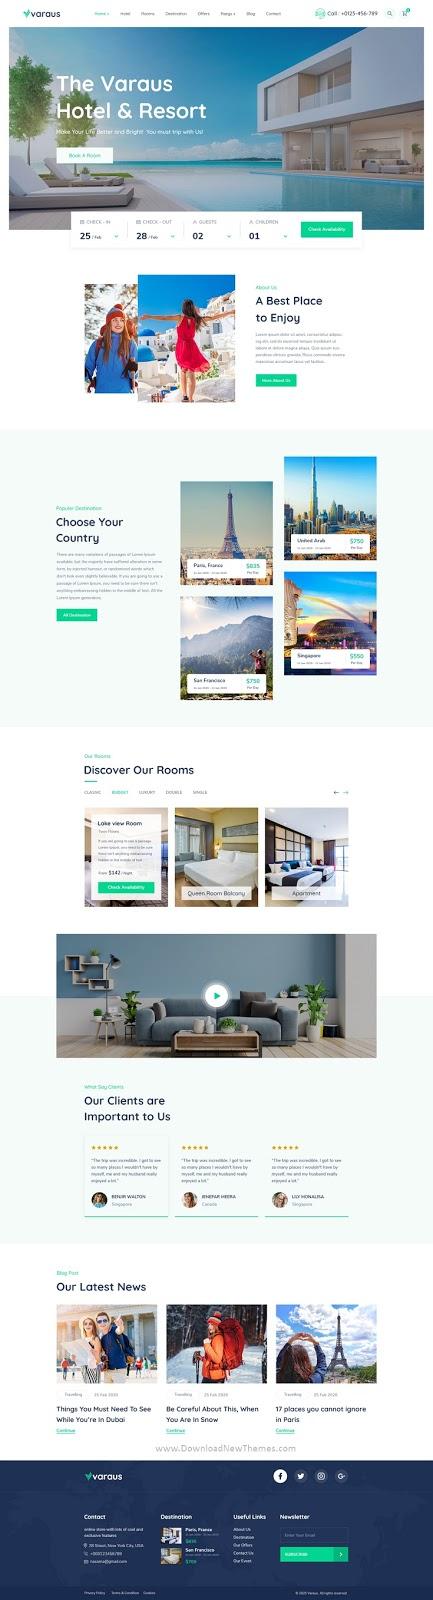 Hotel Booking Website Template